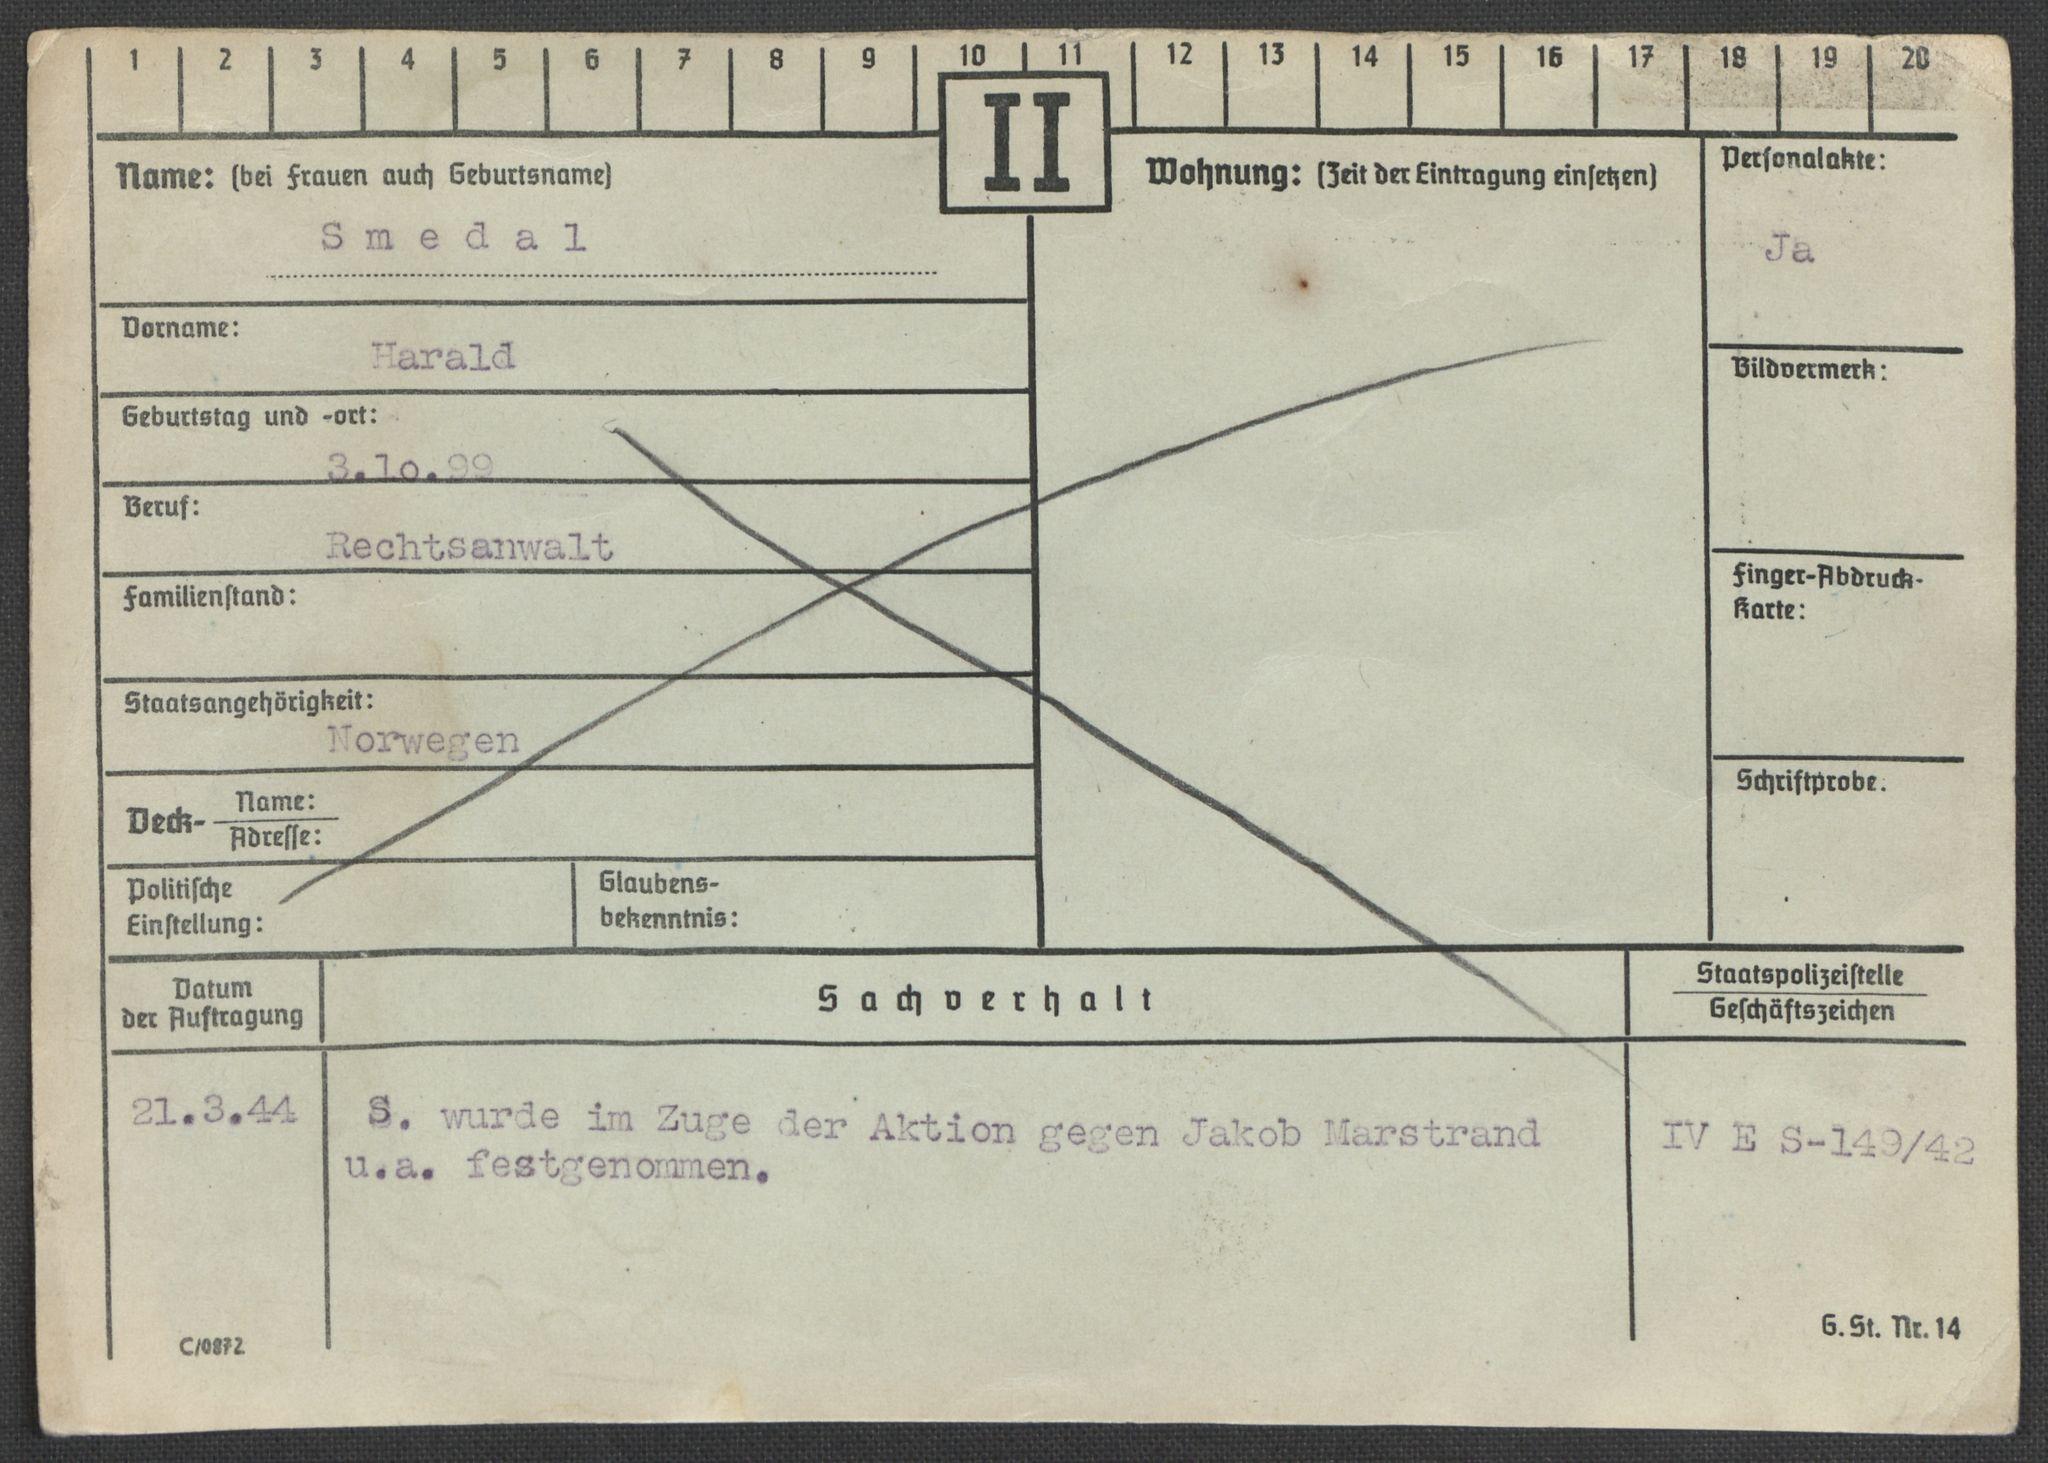 RA, Befehlshaber der Sicherheitspolizei und des SD, E/Ea/Eaa/L0009: Register over norske fanger i Møllergata 19: Ru-Sy, 1940-1945, s. 918